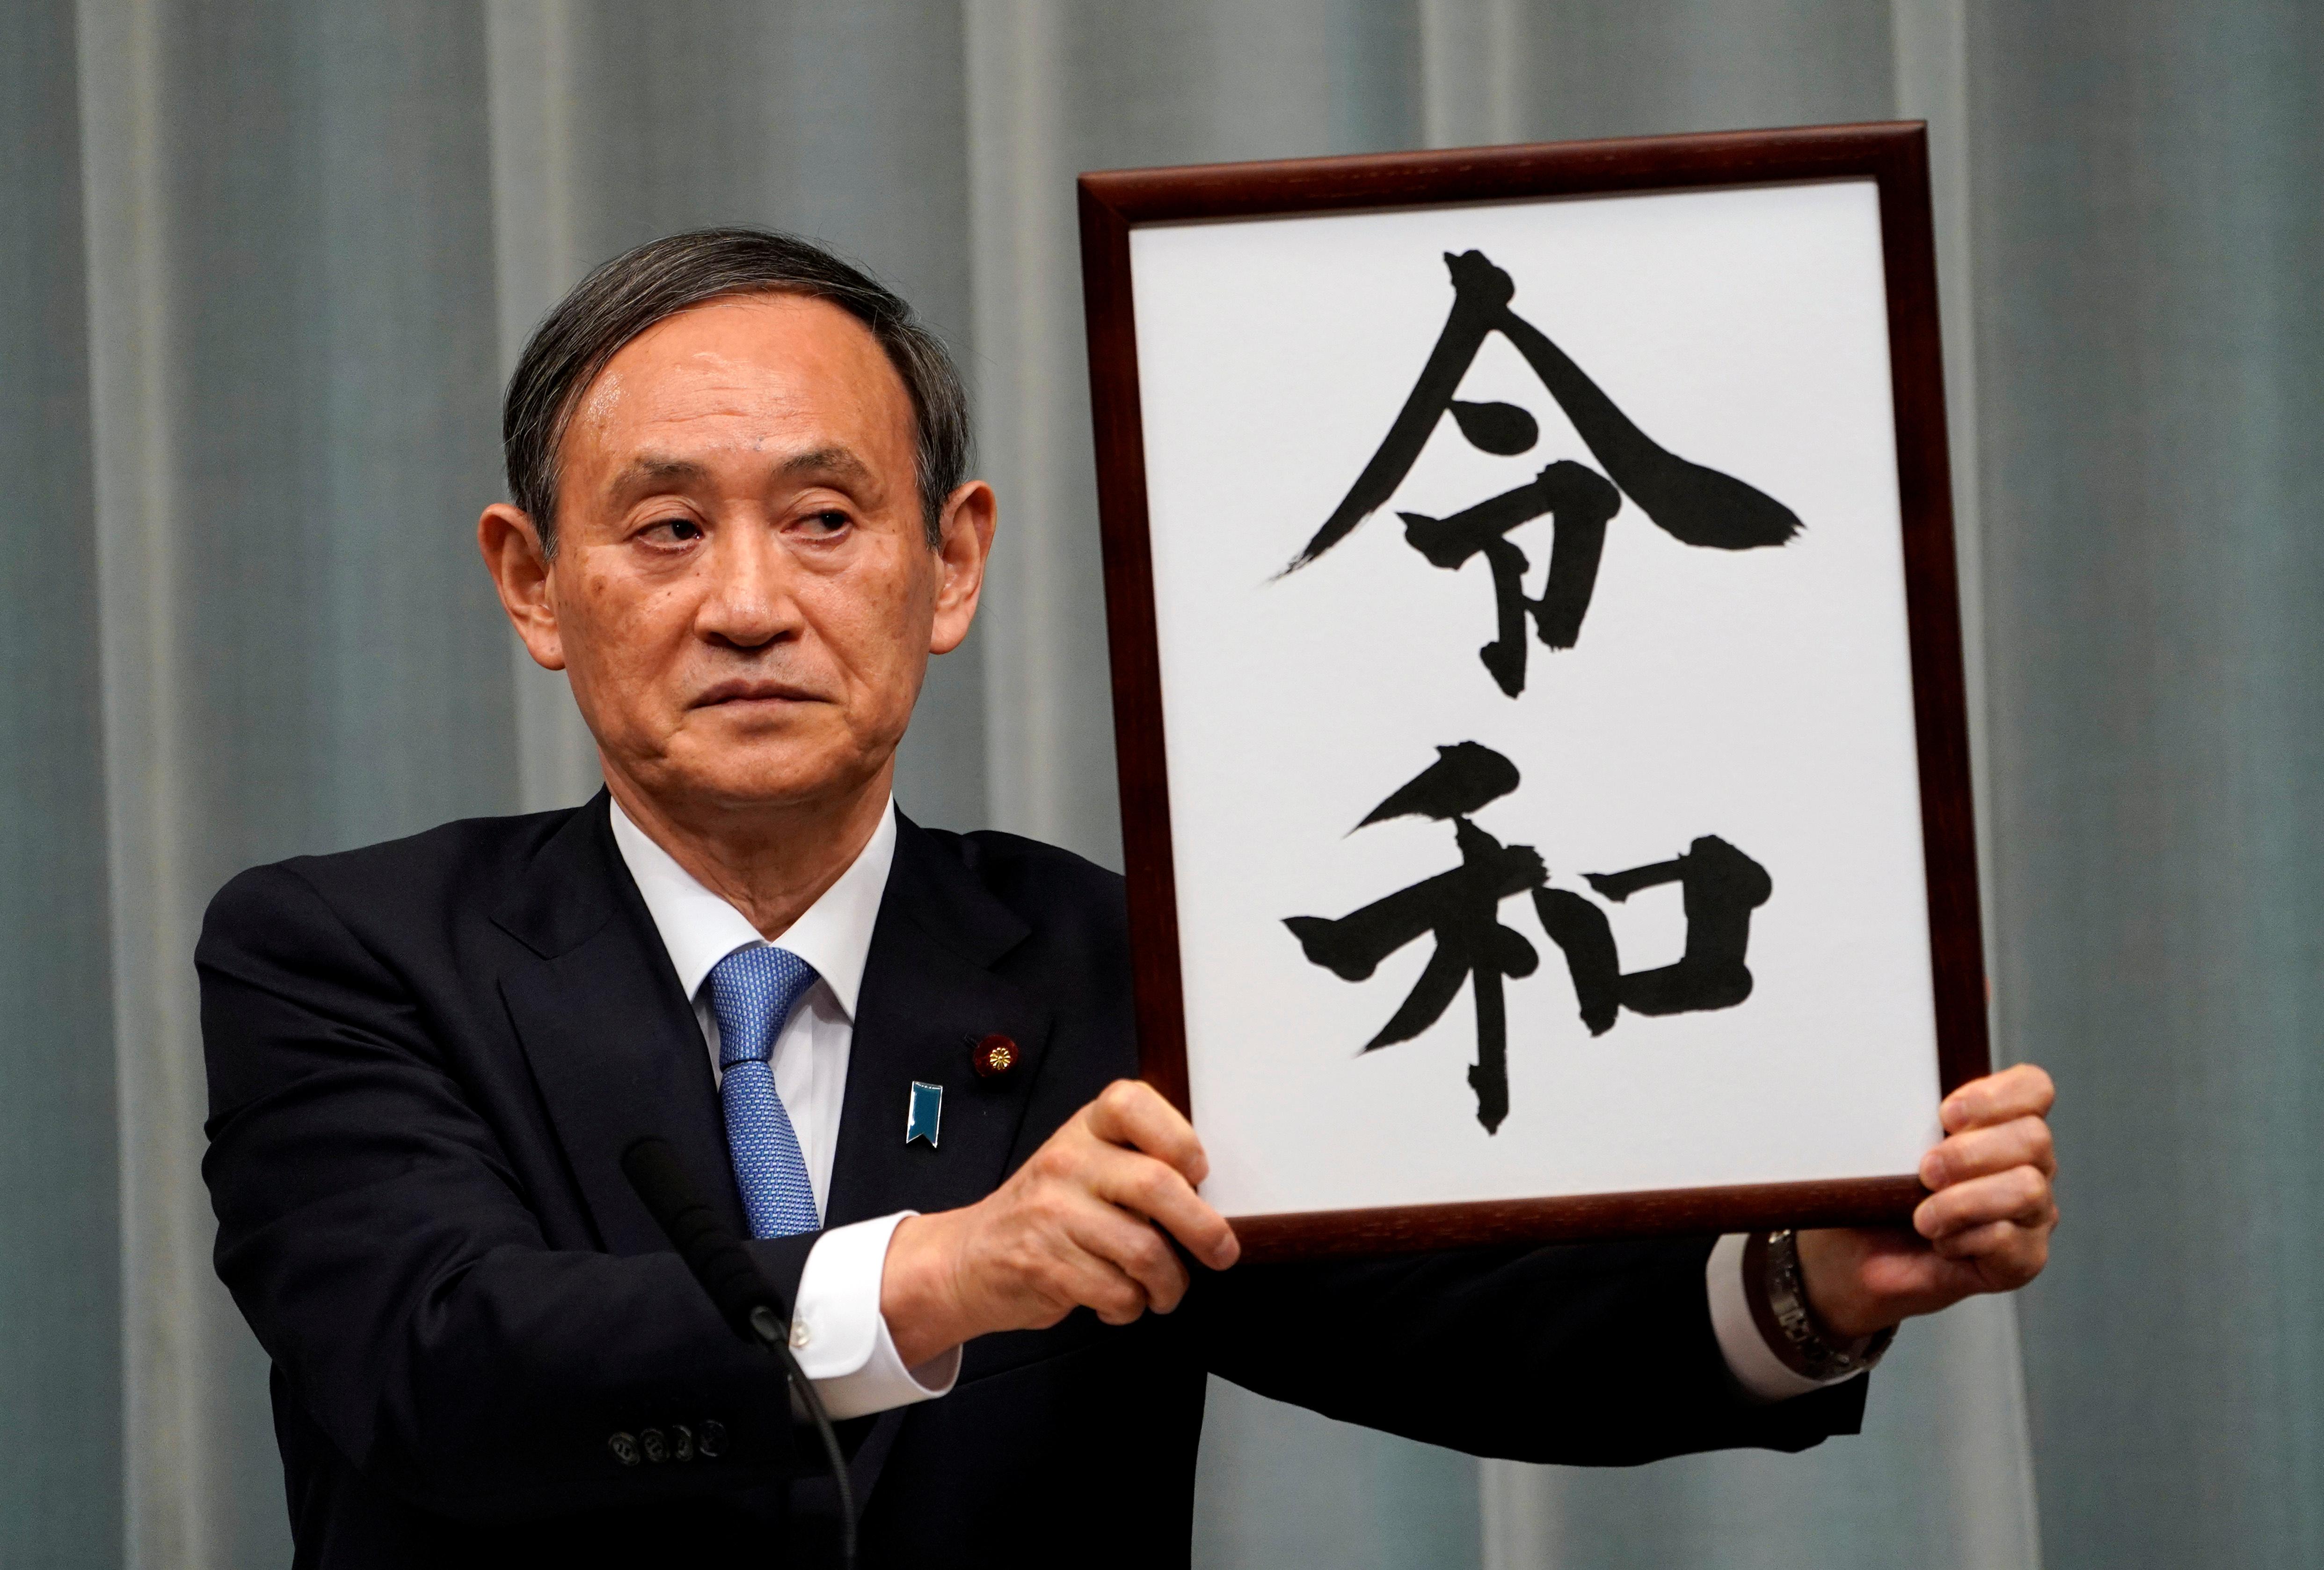 The Reiwa bump: new imperial era name sends ripples across Japan Inc